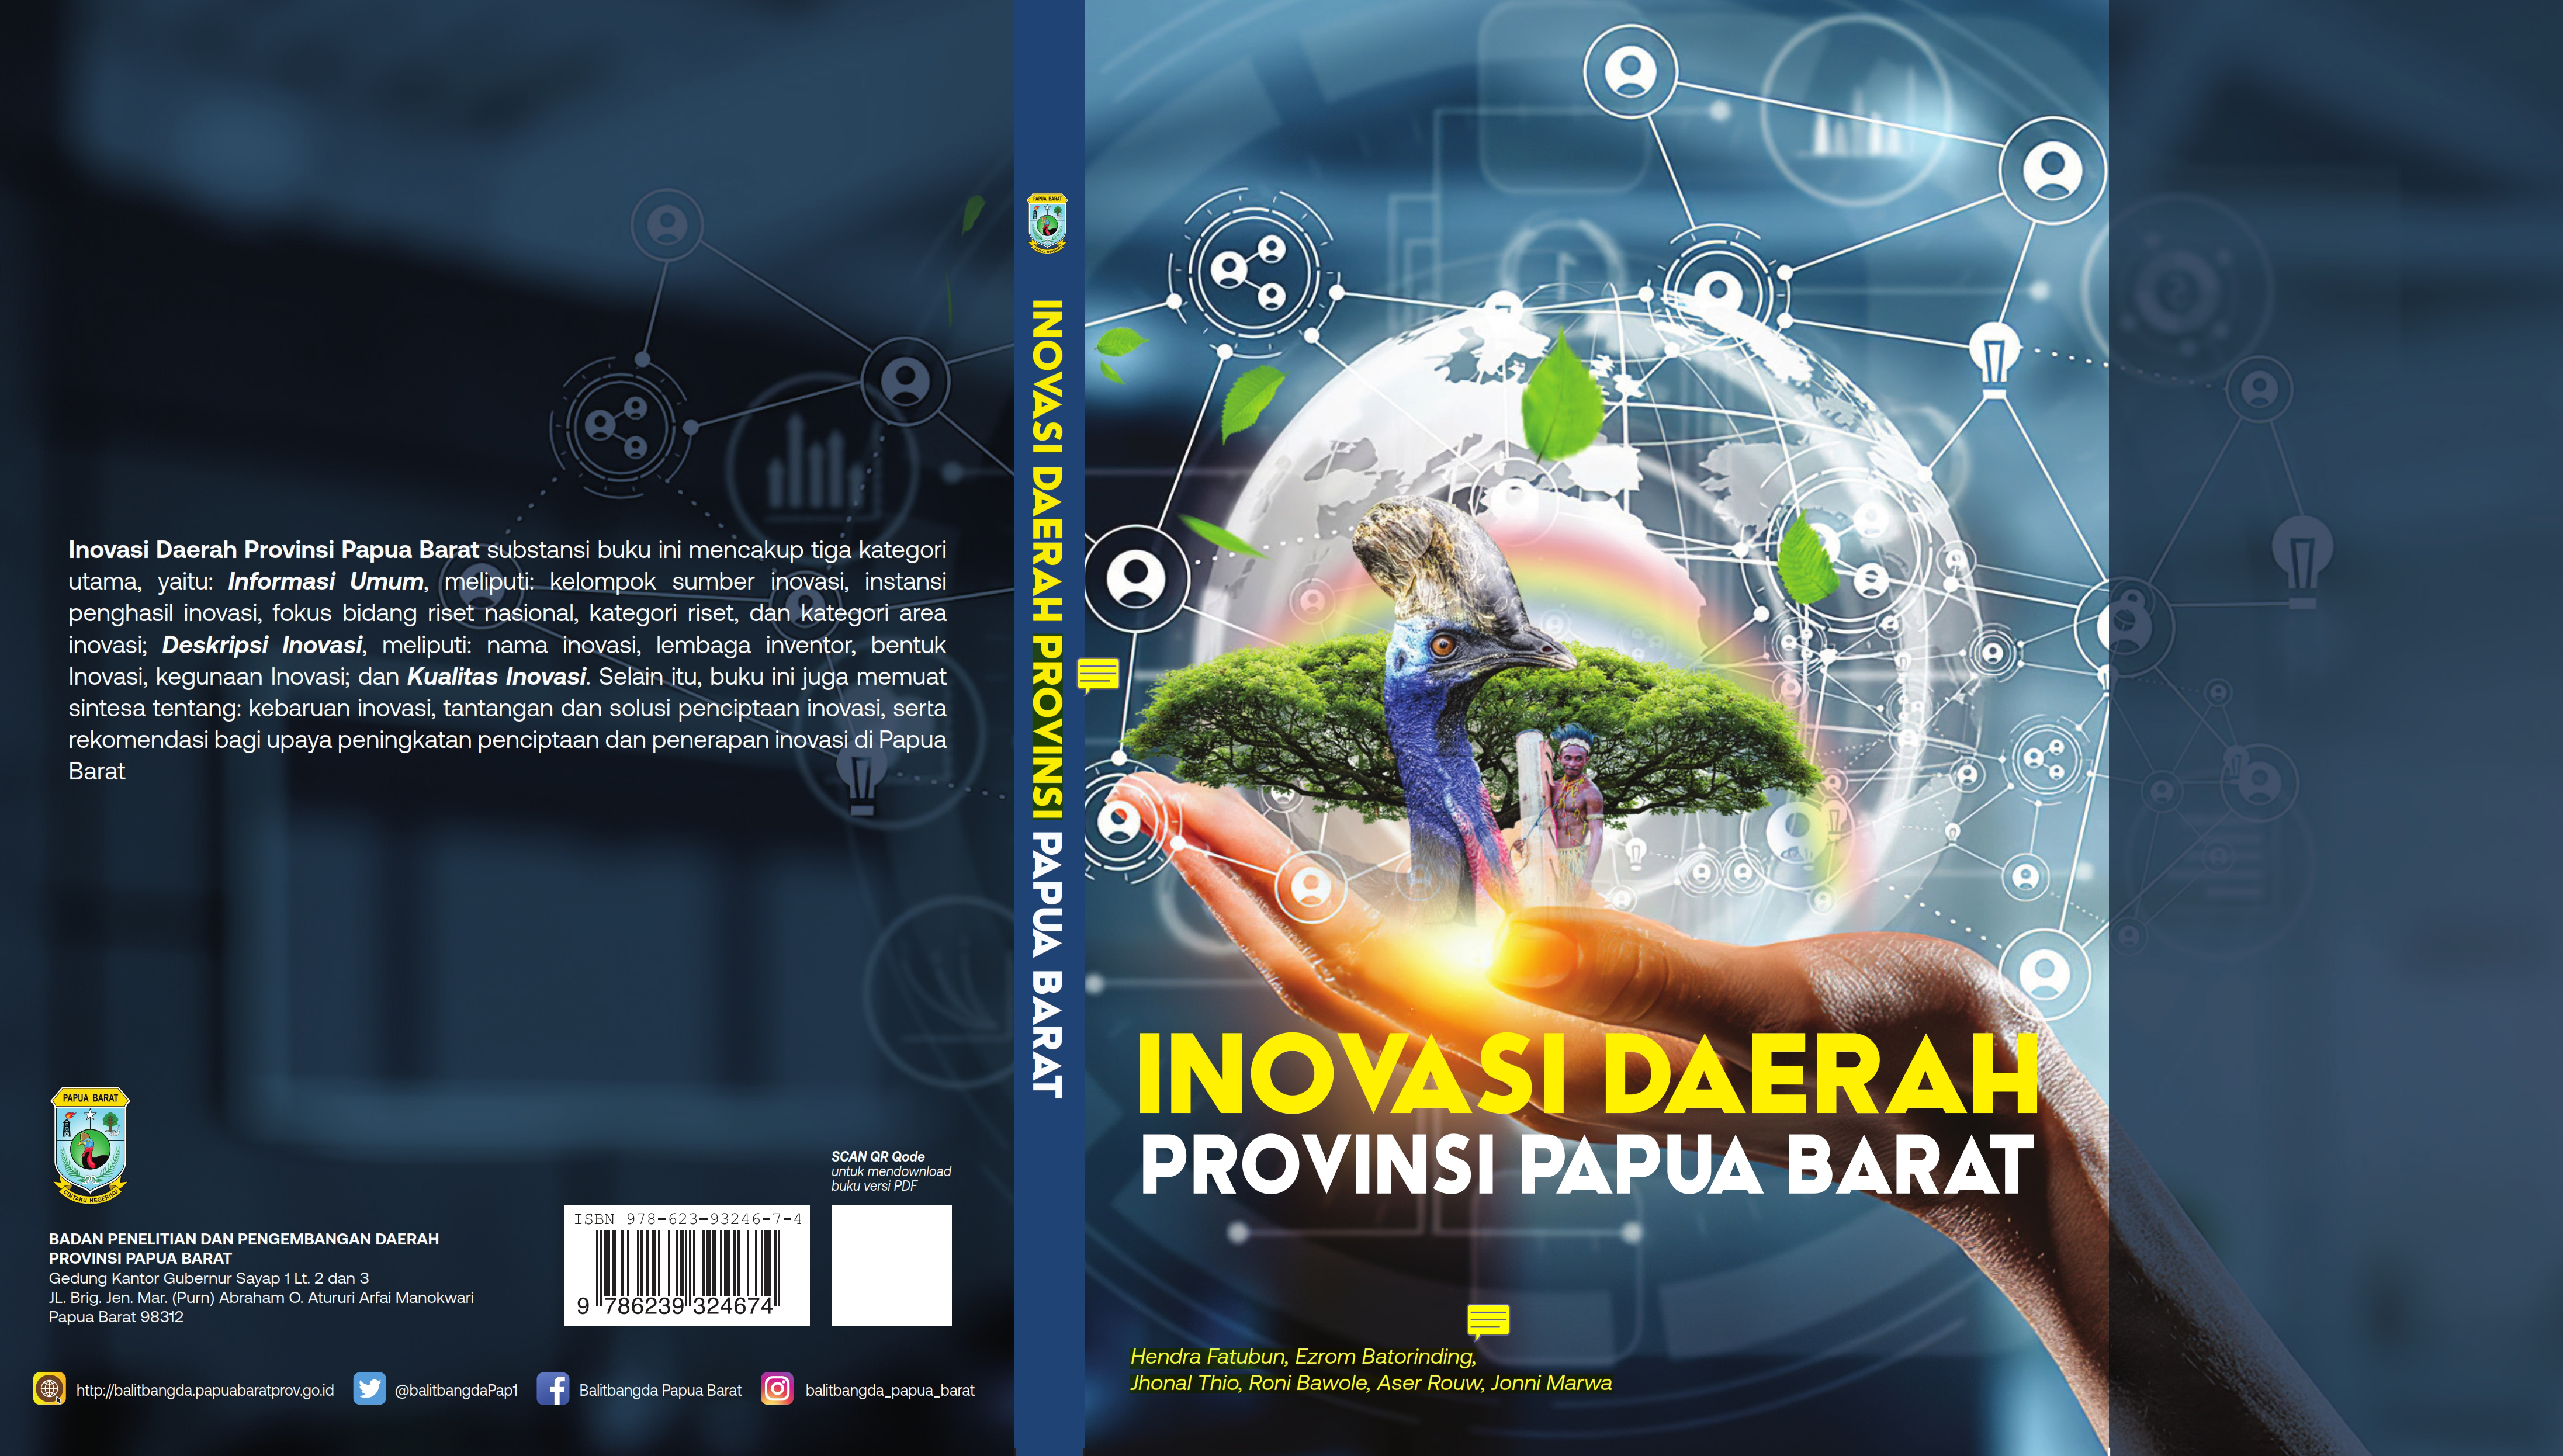 Inovasi Daerah Provinsi Papua Barat